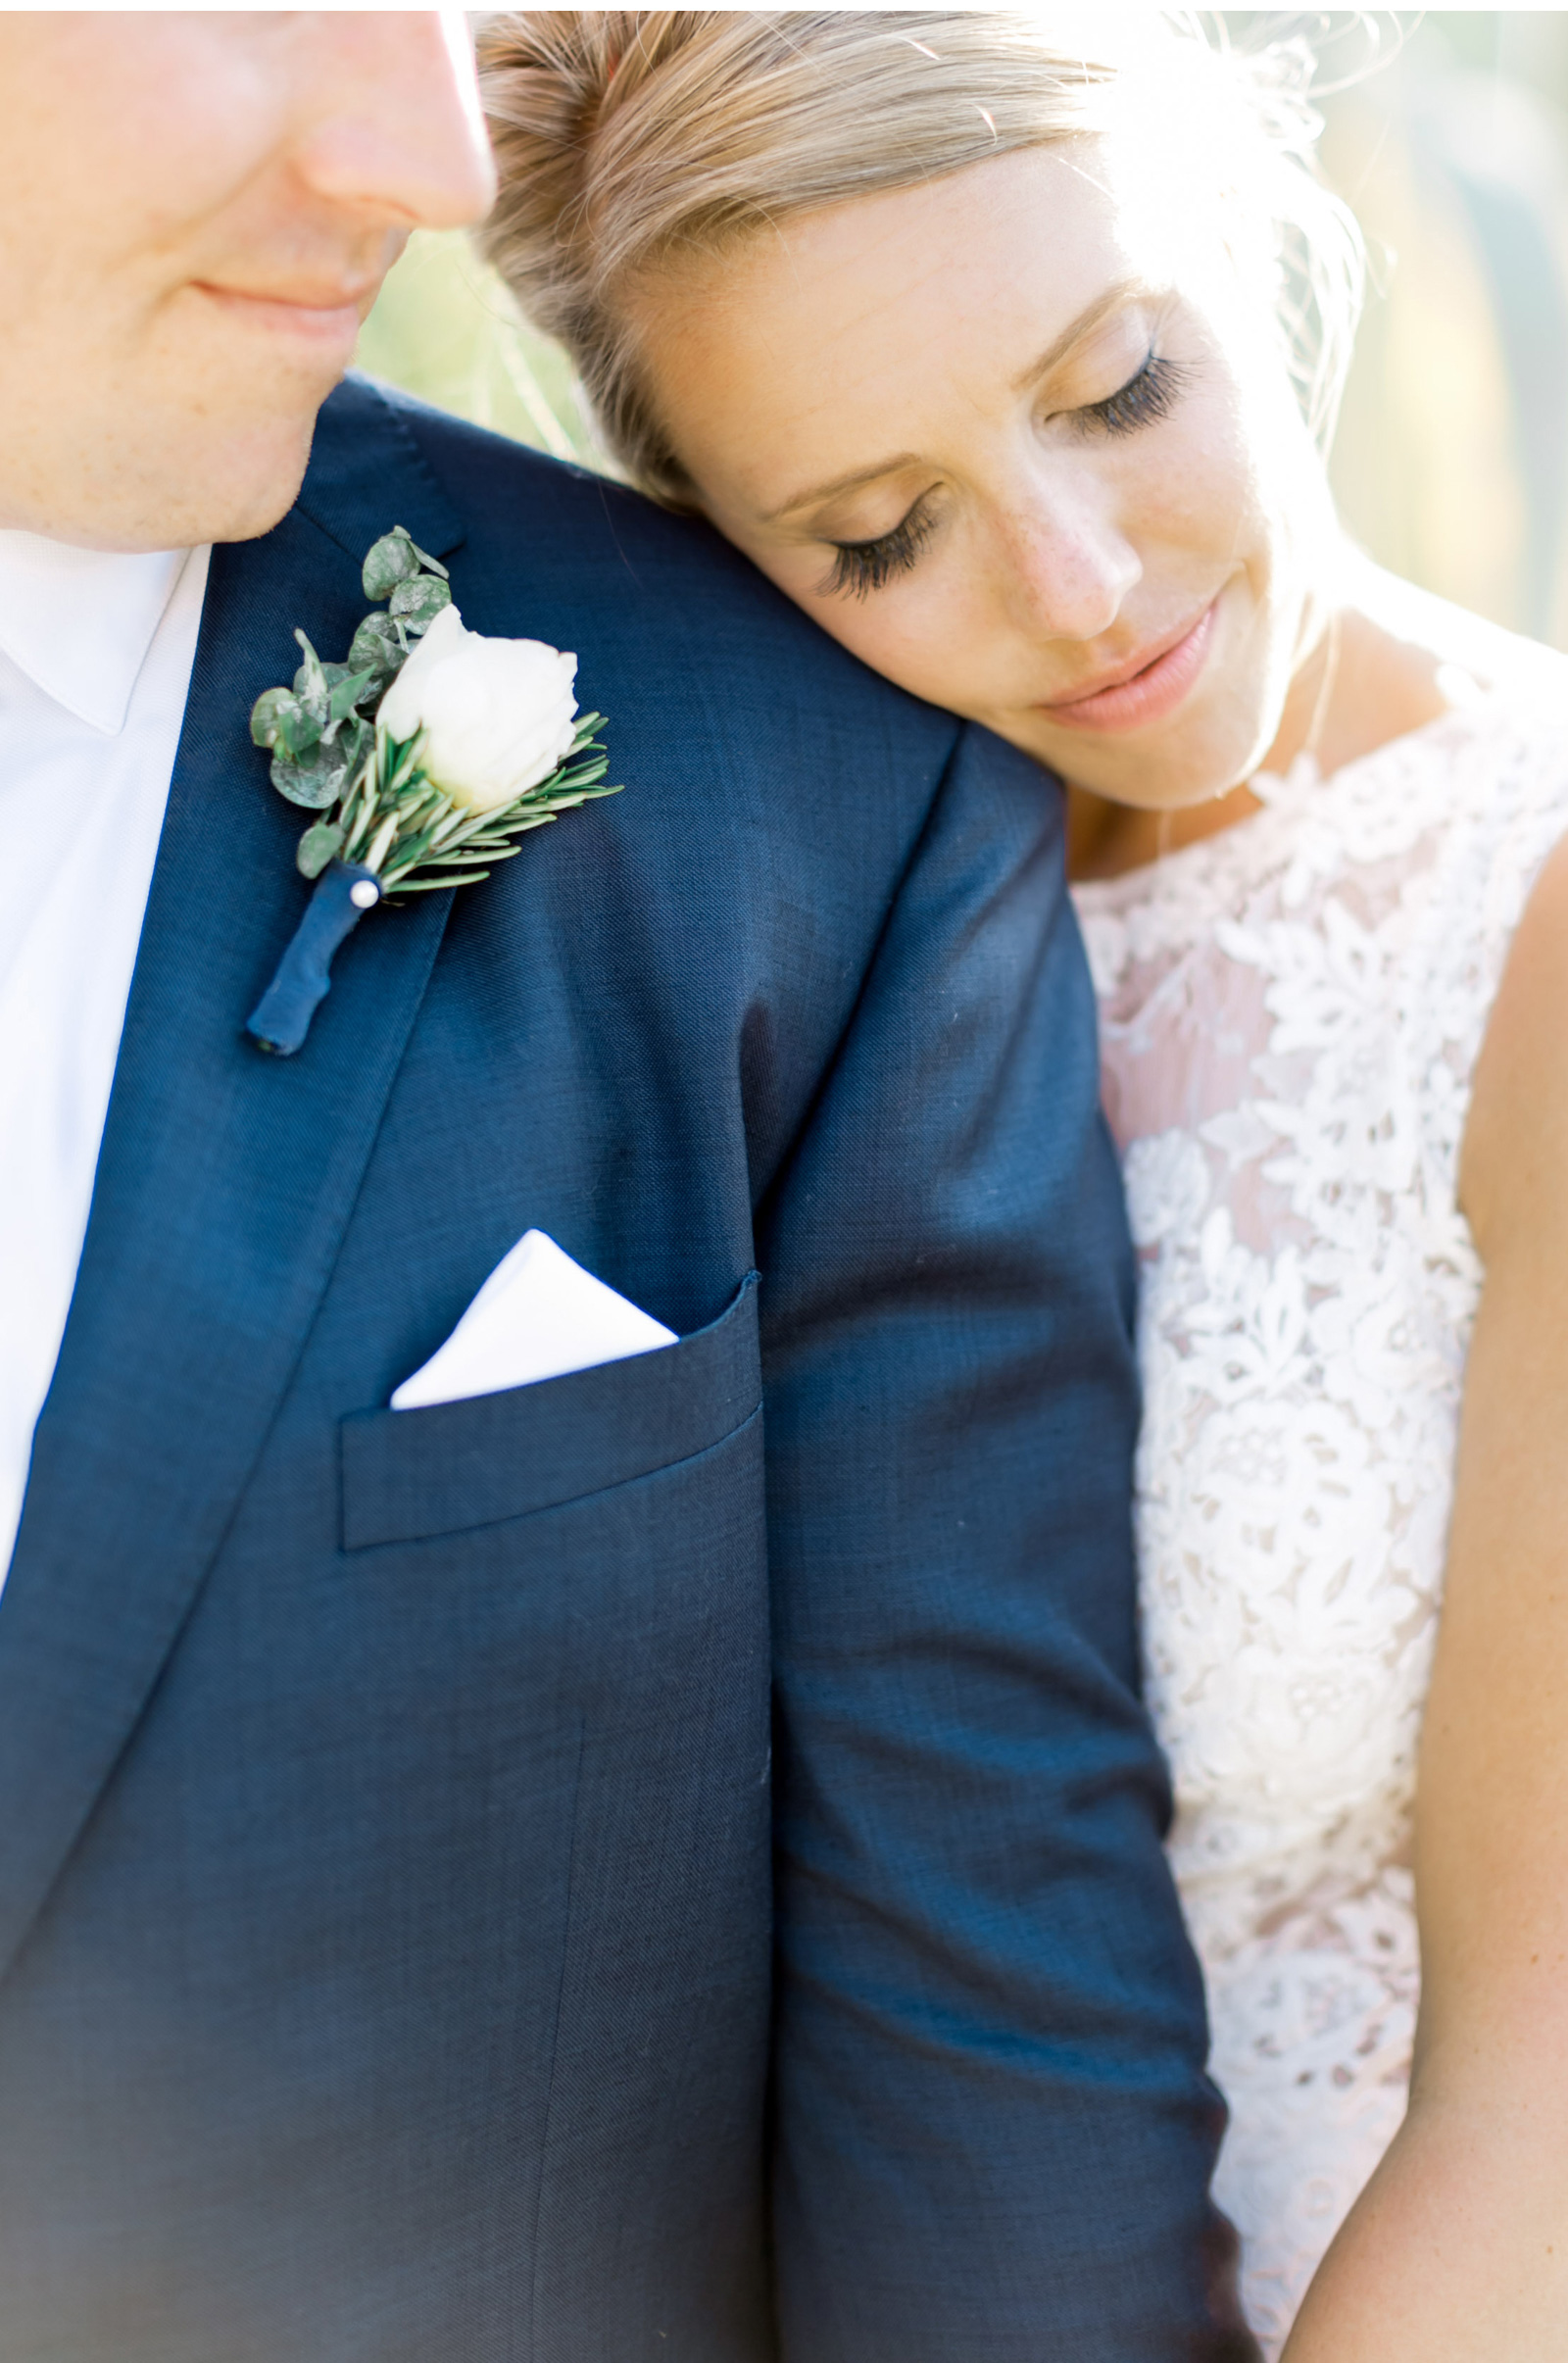 Malibu-Wedding-Photographer-Natalie-Schutt-Photography-Fine-Art-Film-Photography_13.jpg